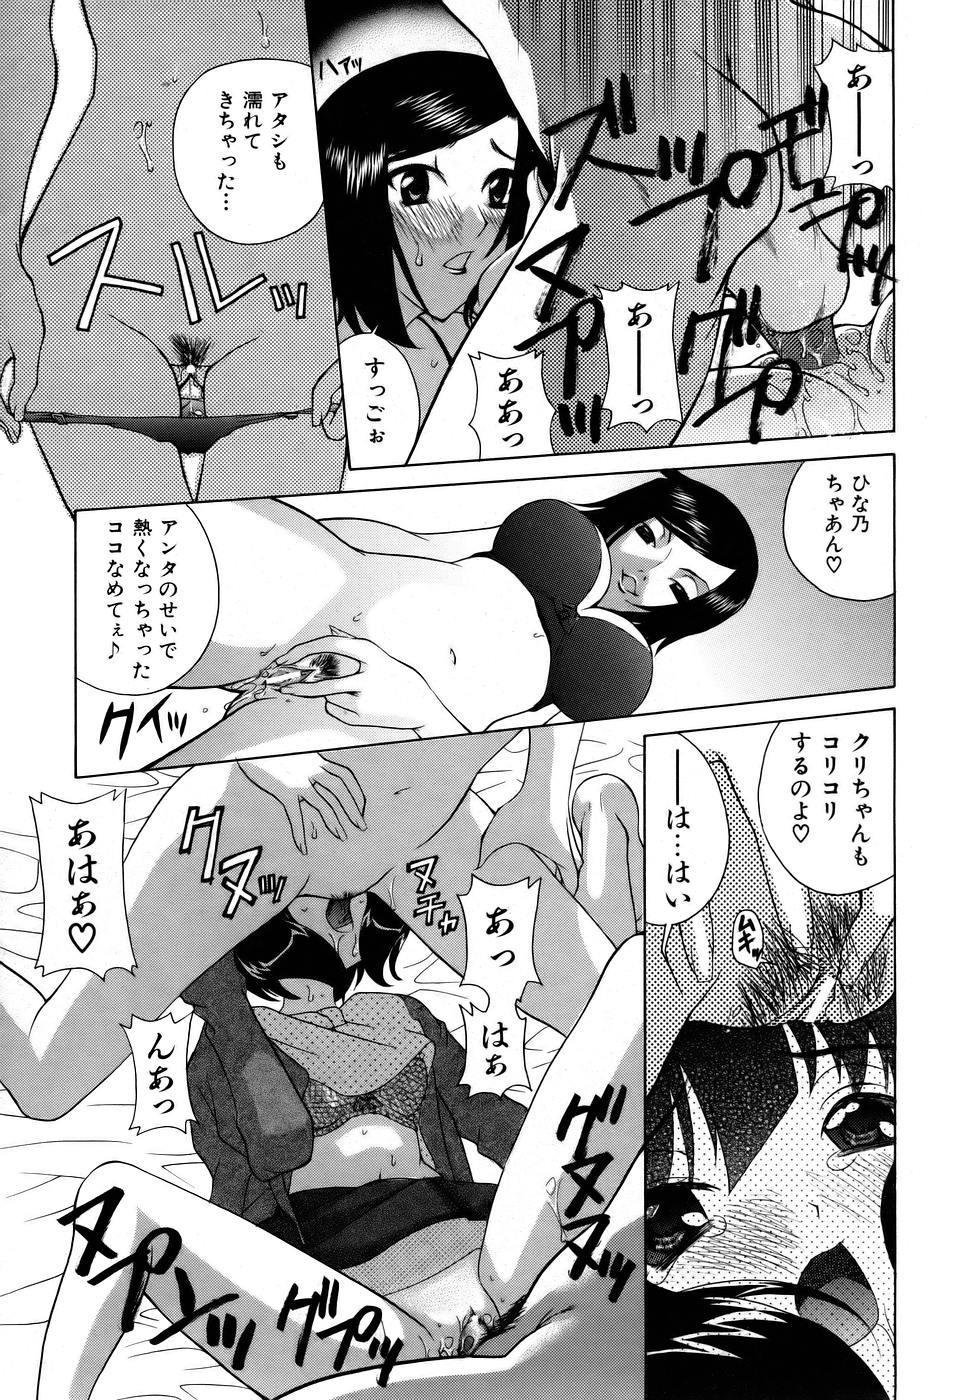 COMIC AUN 2005-12 Vol. 115 318